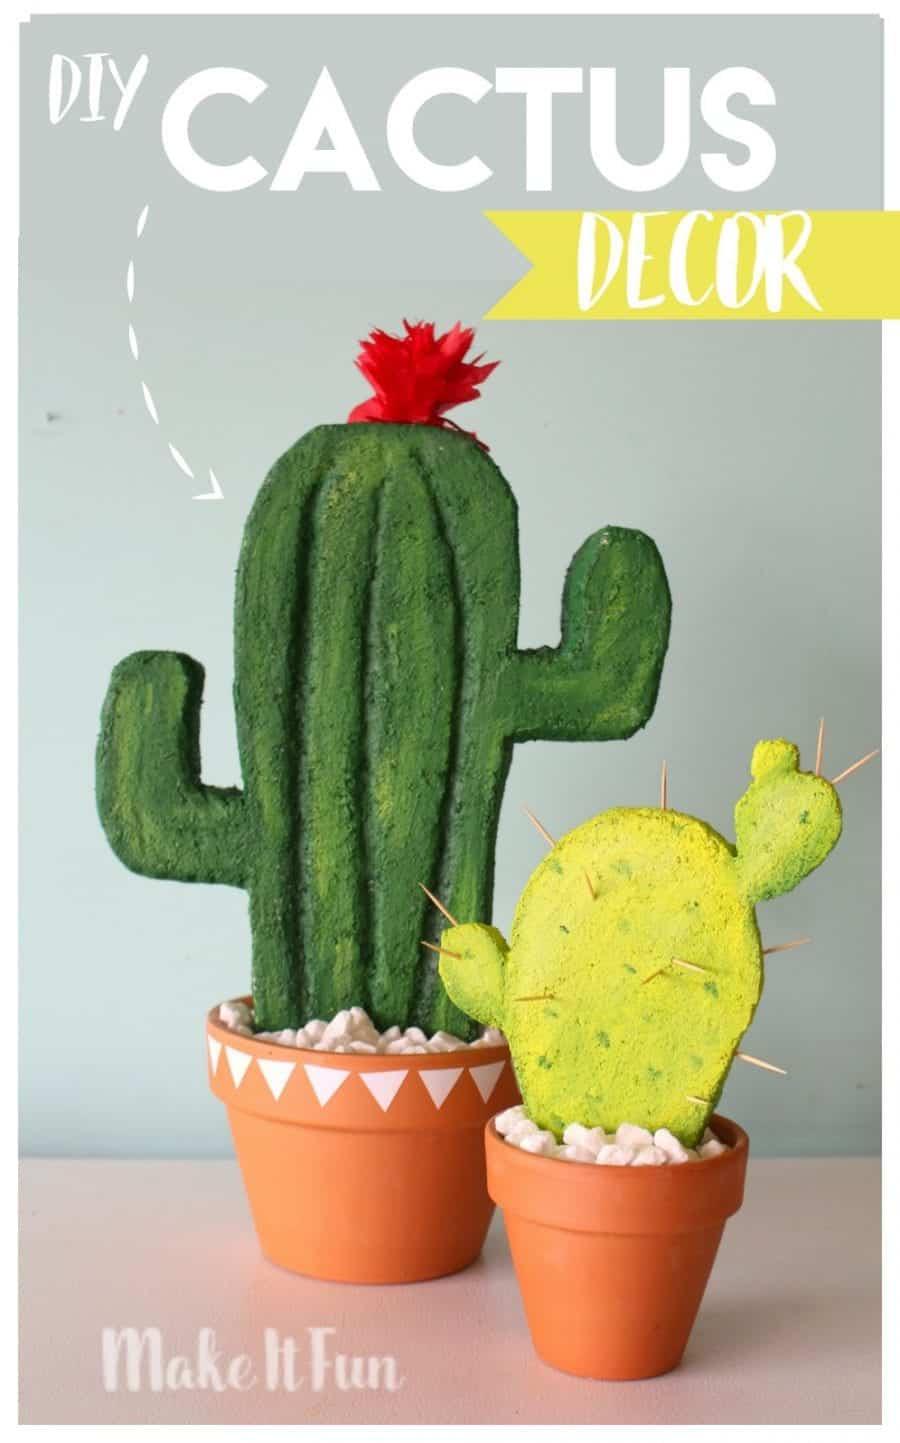 diy-cactus-plants-for-cute-decor